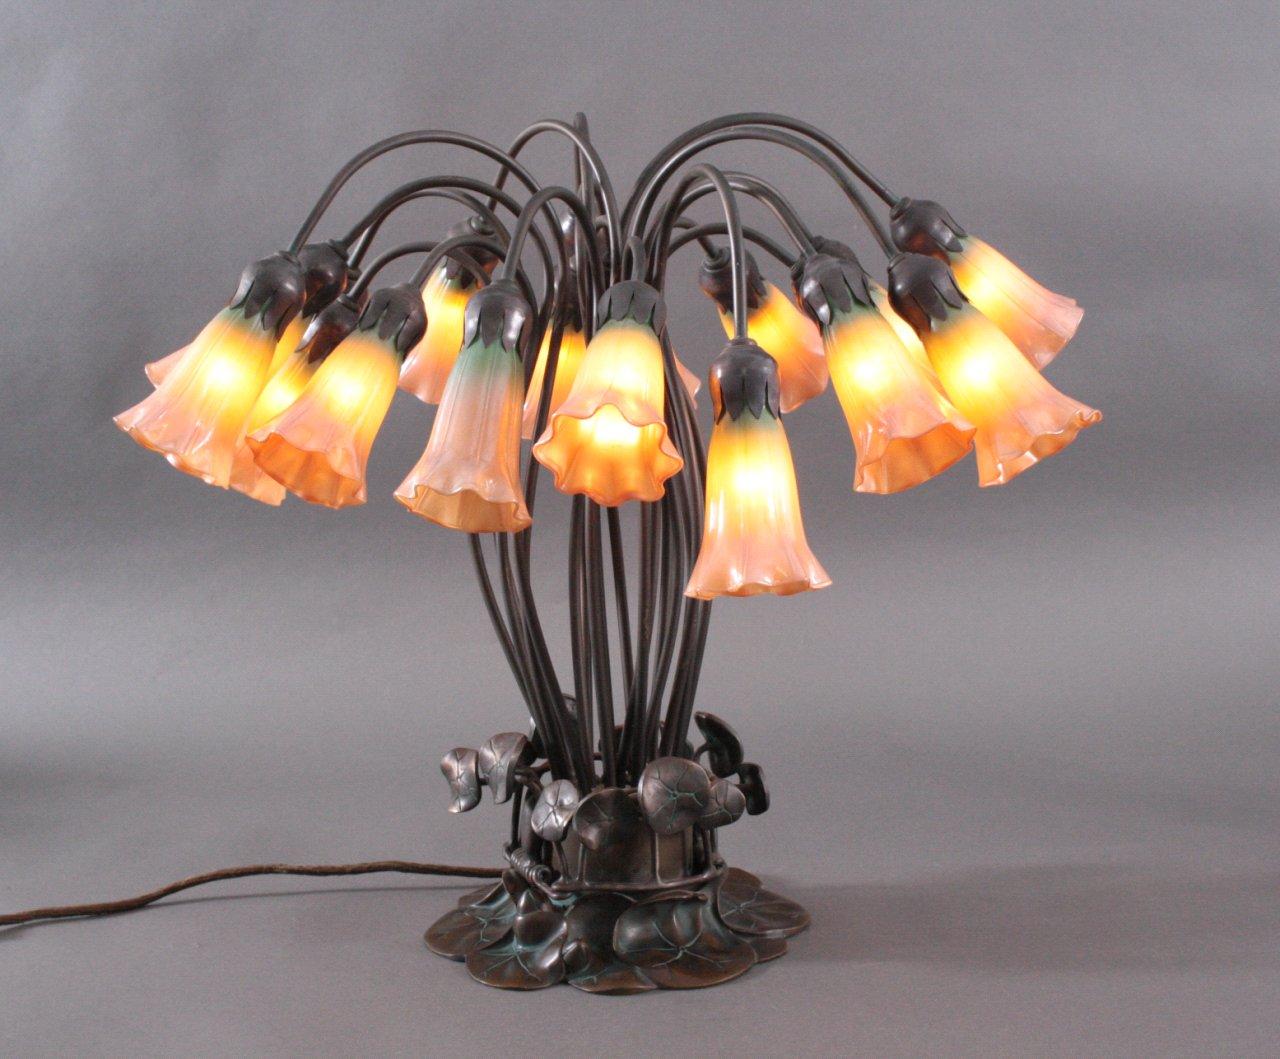 Tischlampe im Tiffany Stil, 18-flammig